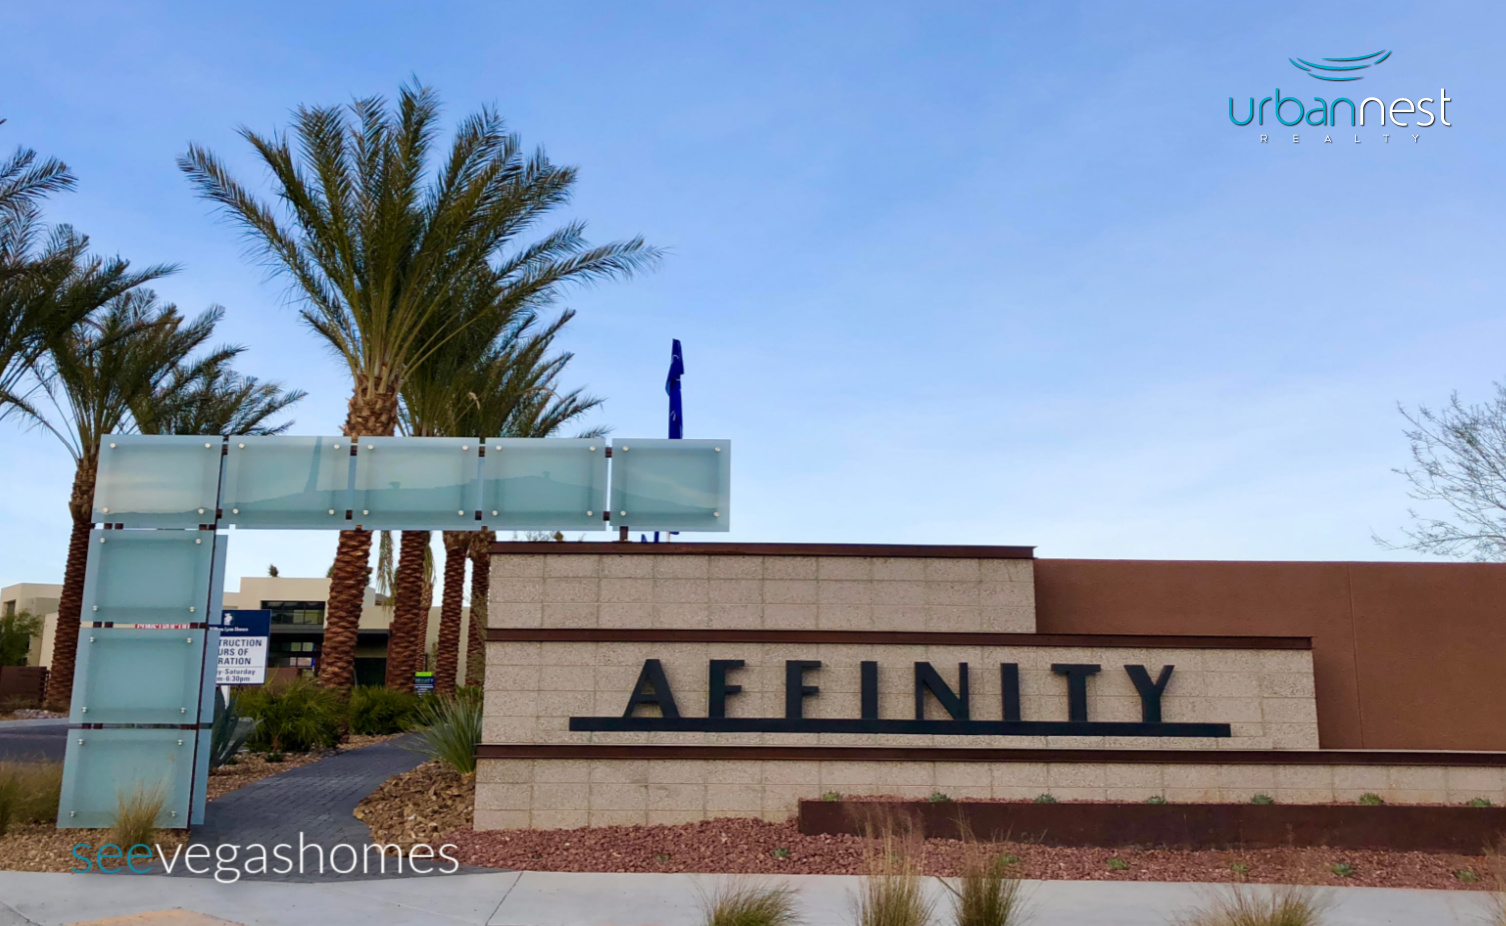 /userfiles/742/image/Affinity_Summerlin_Las_Vegas_NV_89135_SeeVegasHomes